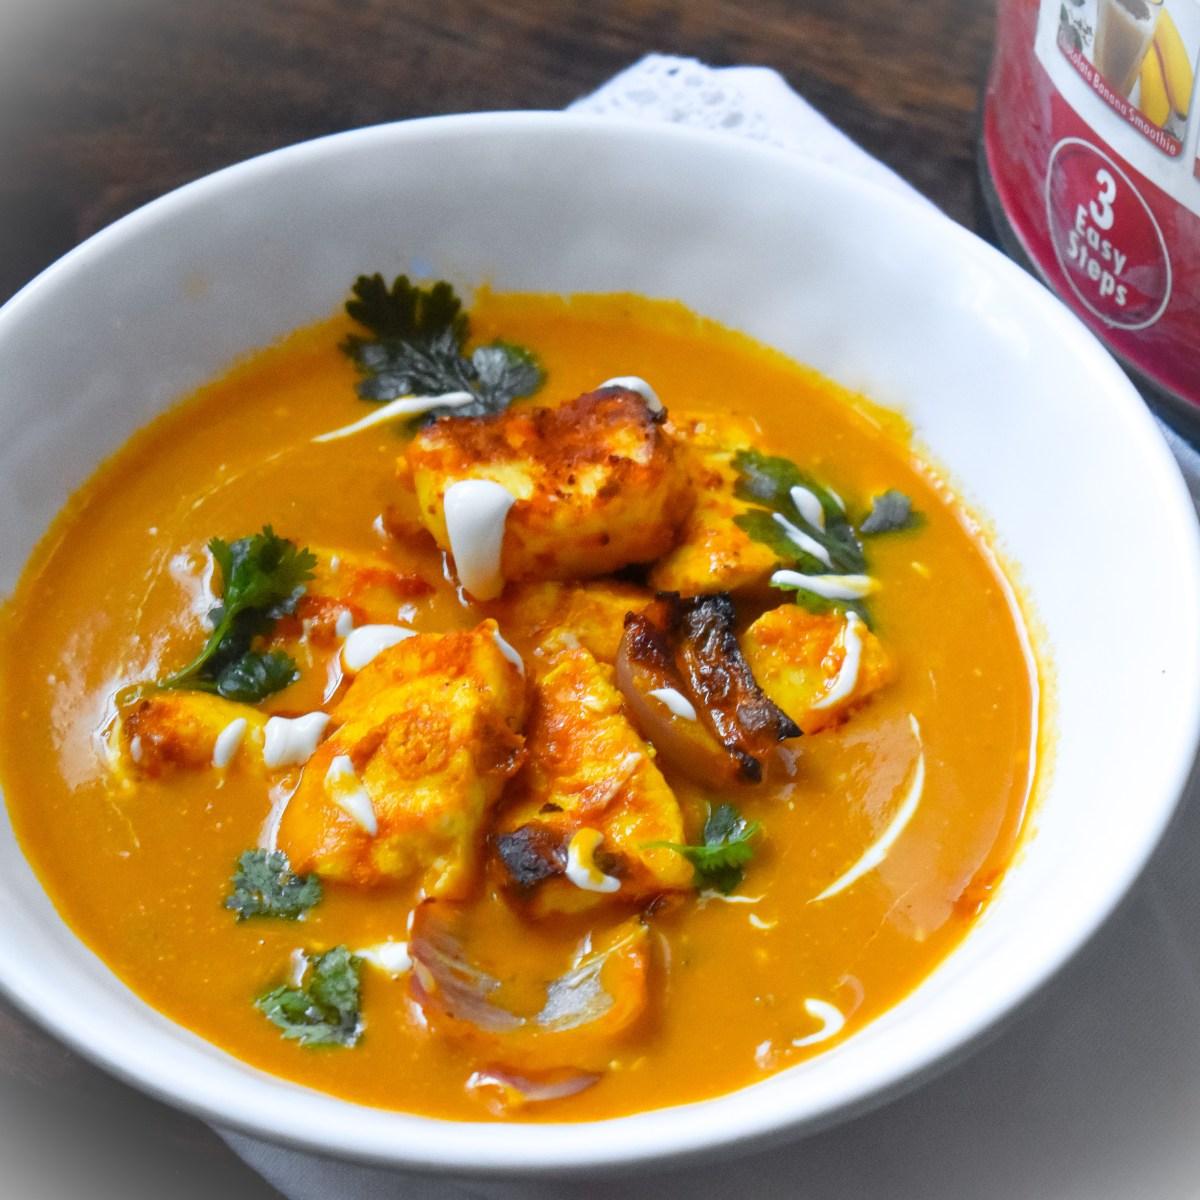 Soup Maker Paneer Tikka Masala - Parveenskitchen.com